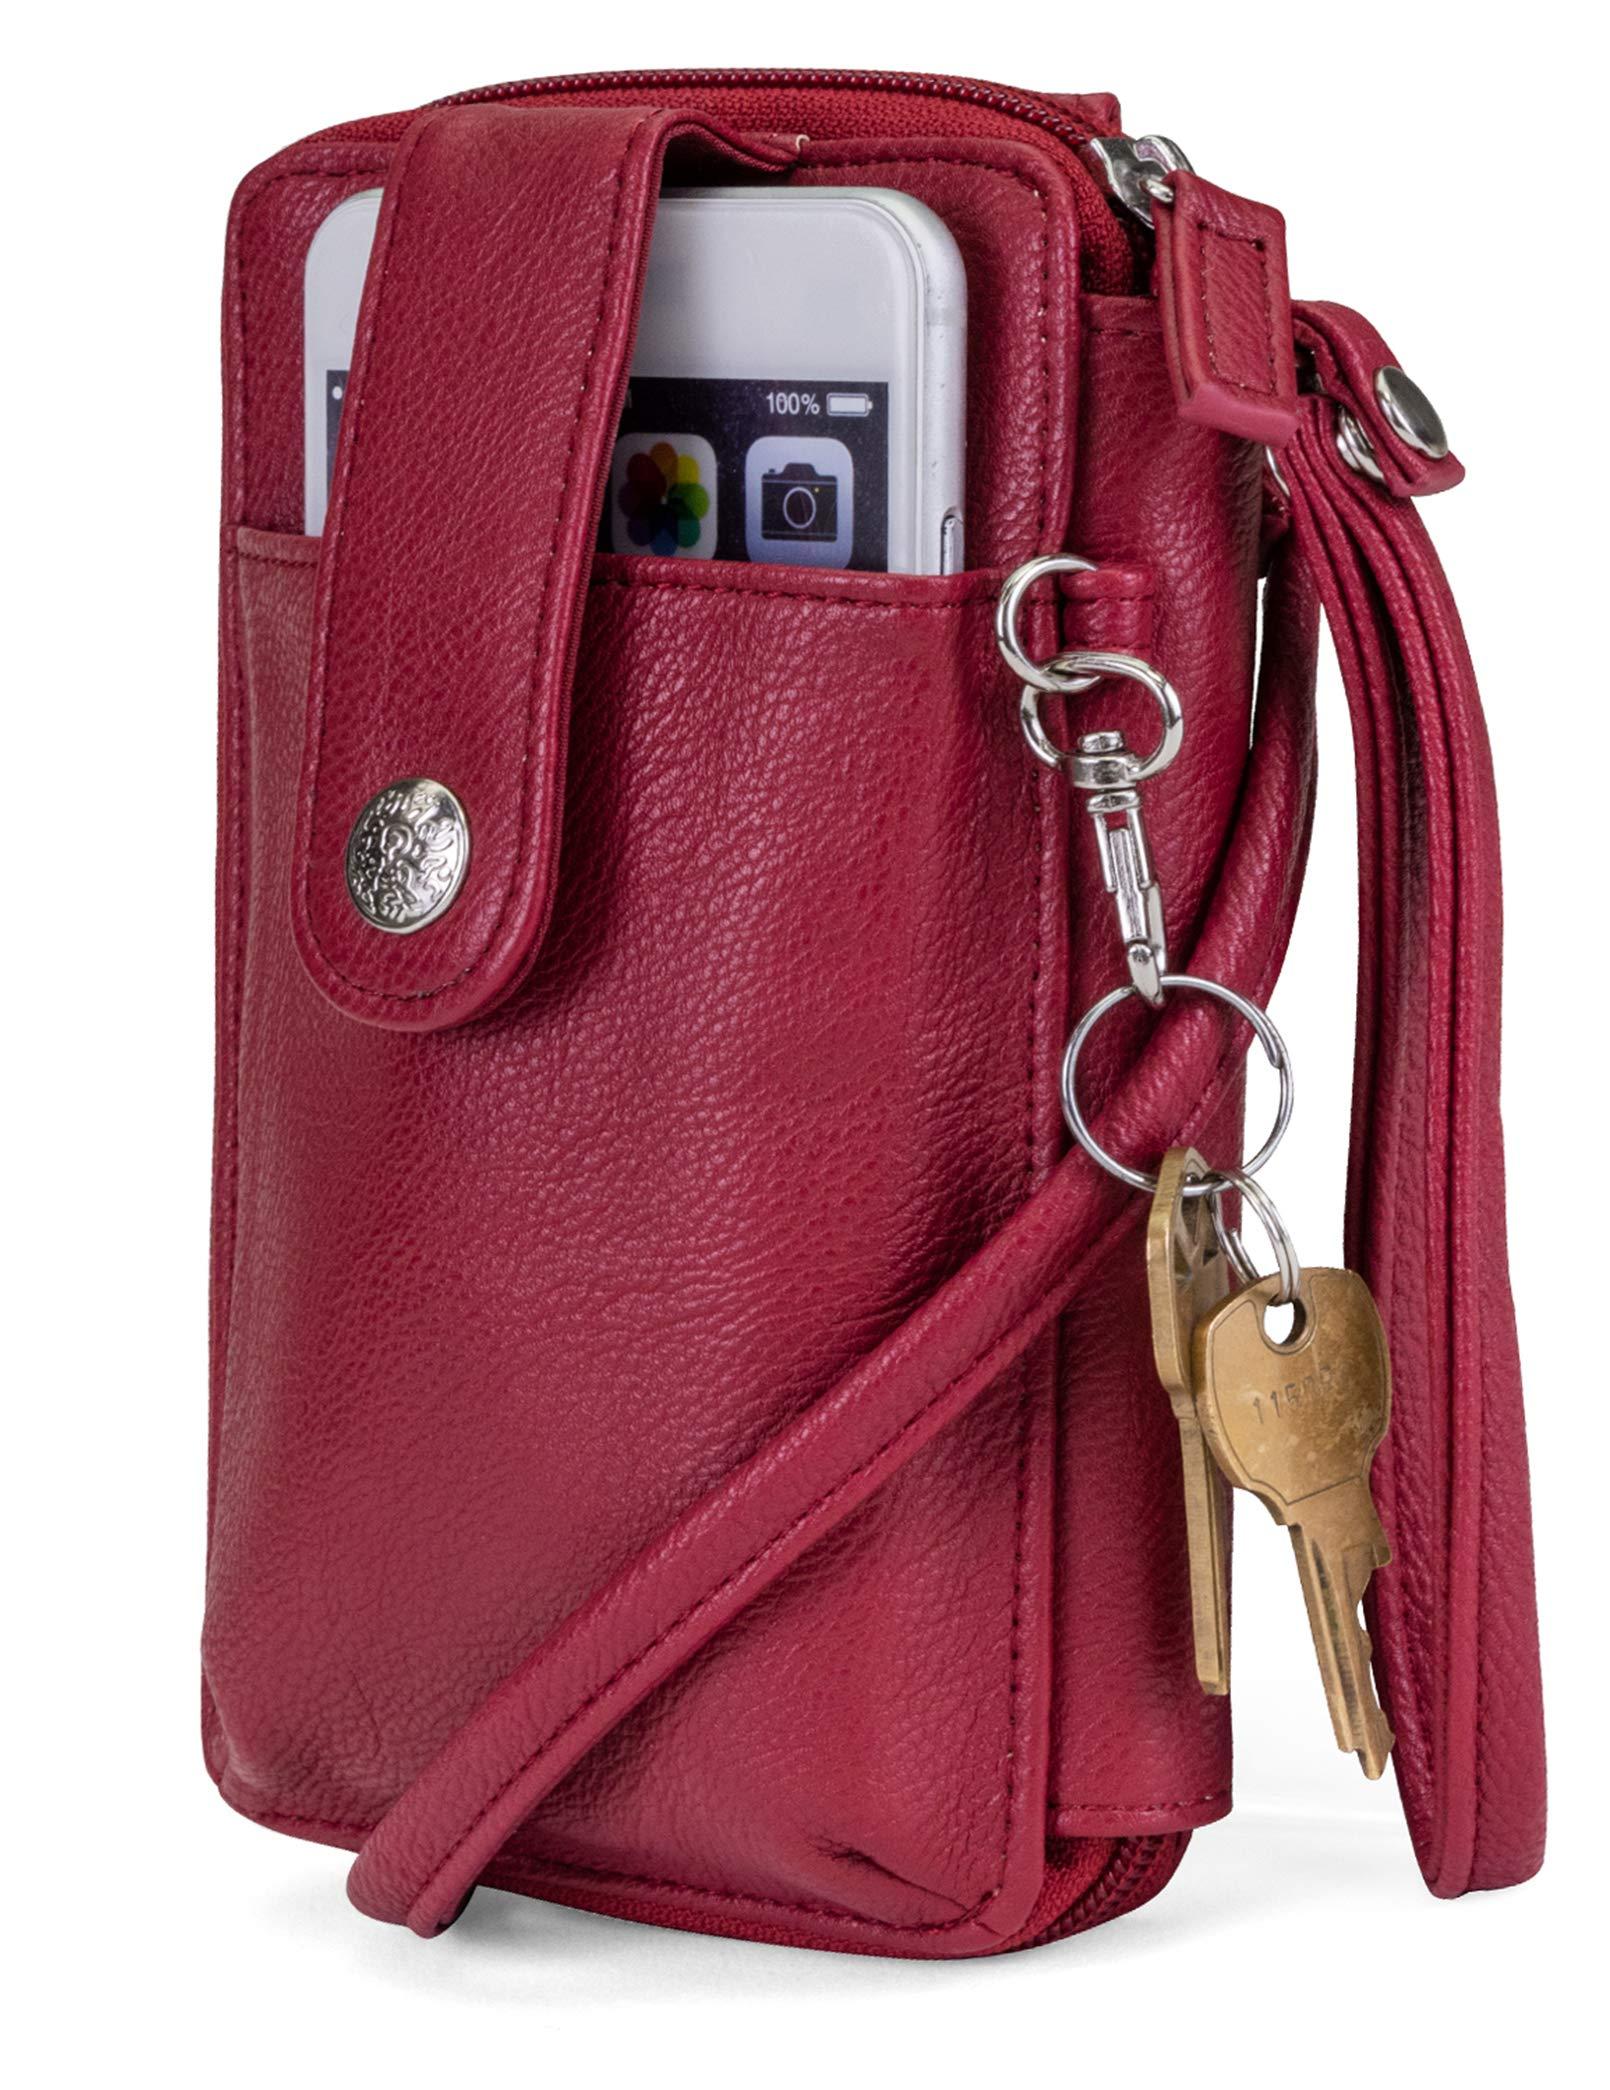 Mundi Jacqui Vegan Leather RFID Womens Crossbody Cell Phone Purse Holder Wallet ((Red))